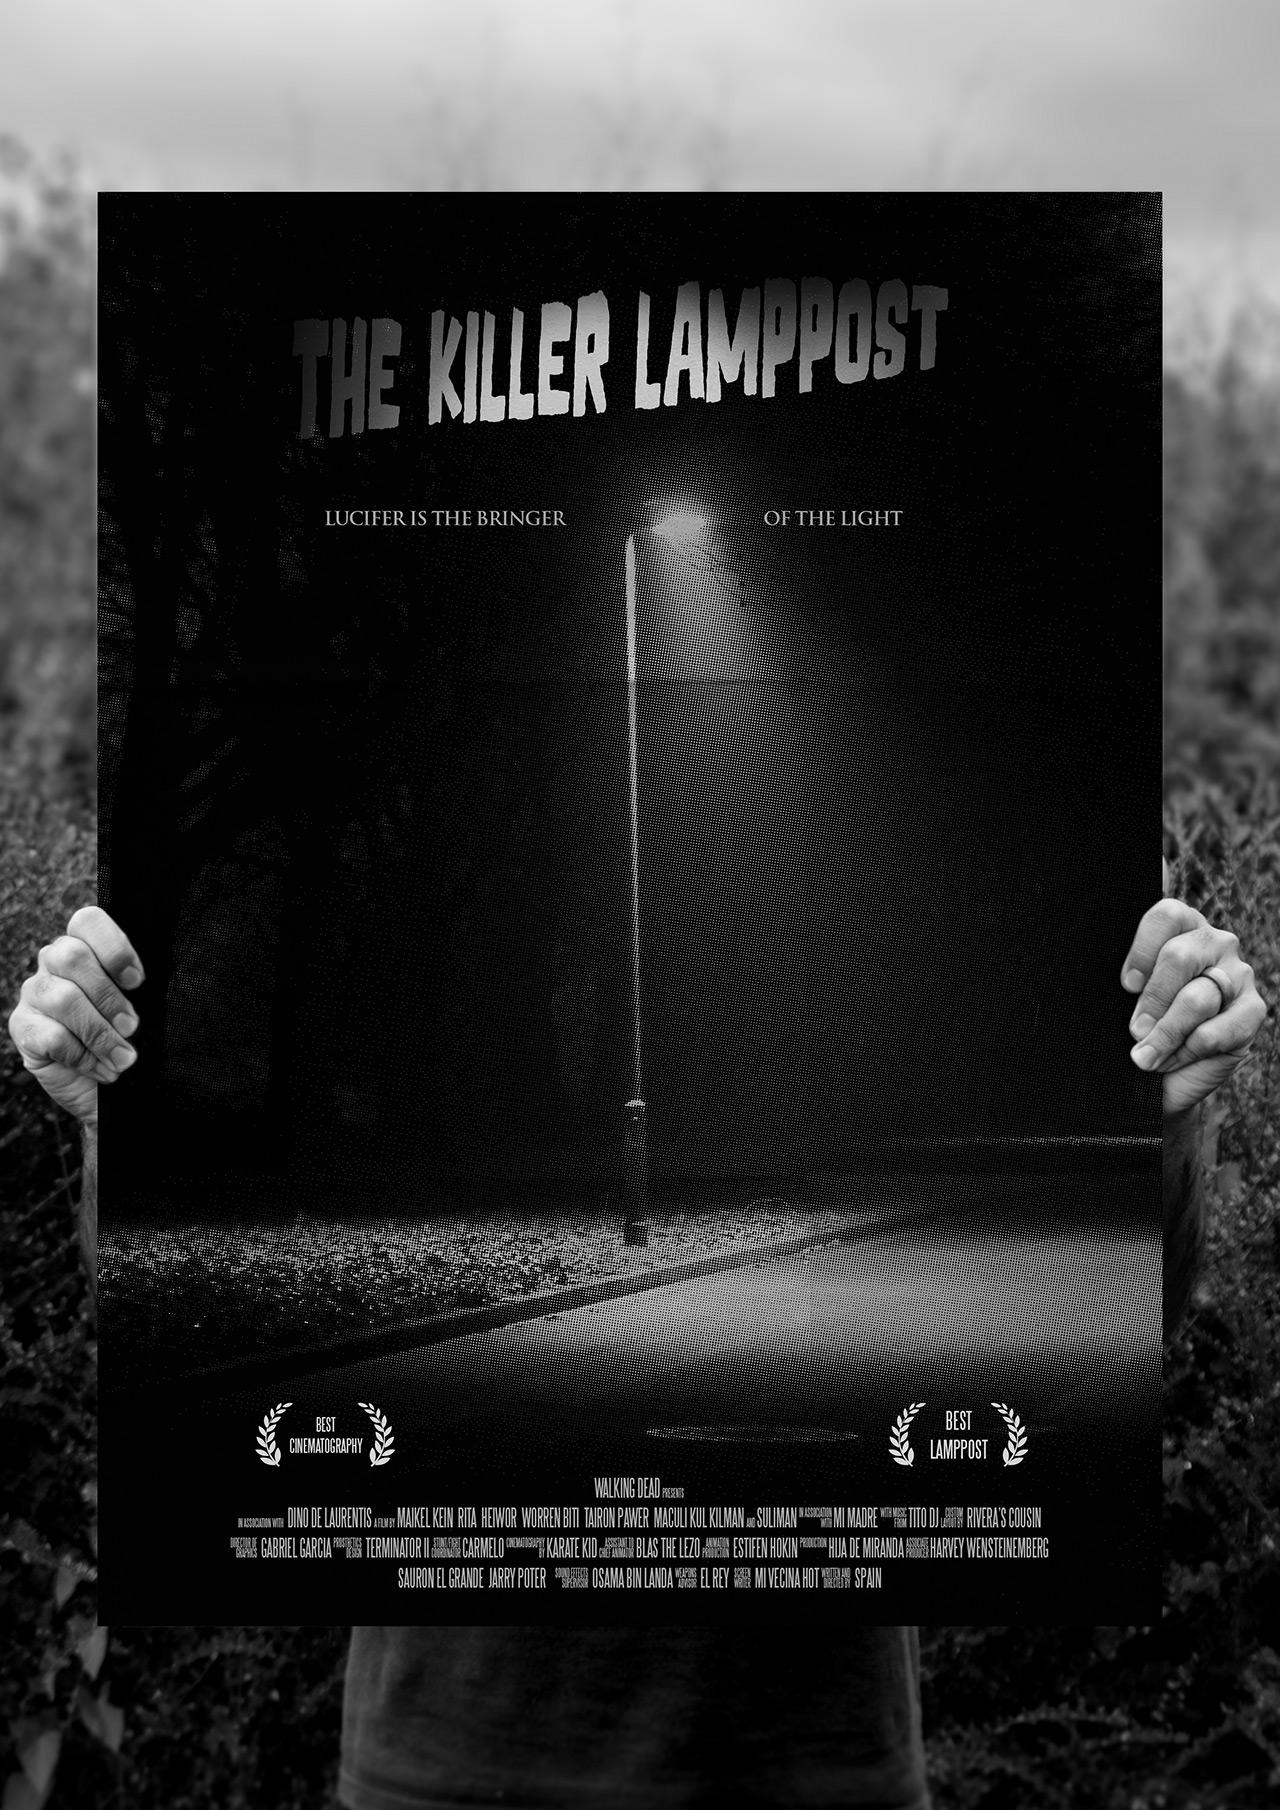 The Killer Lamppost